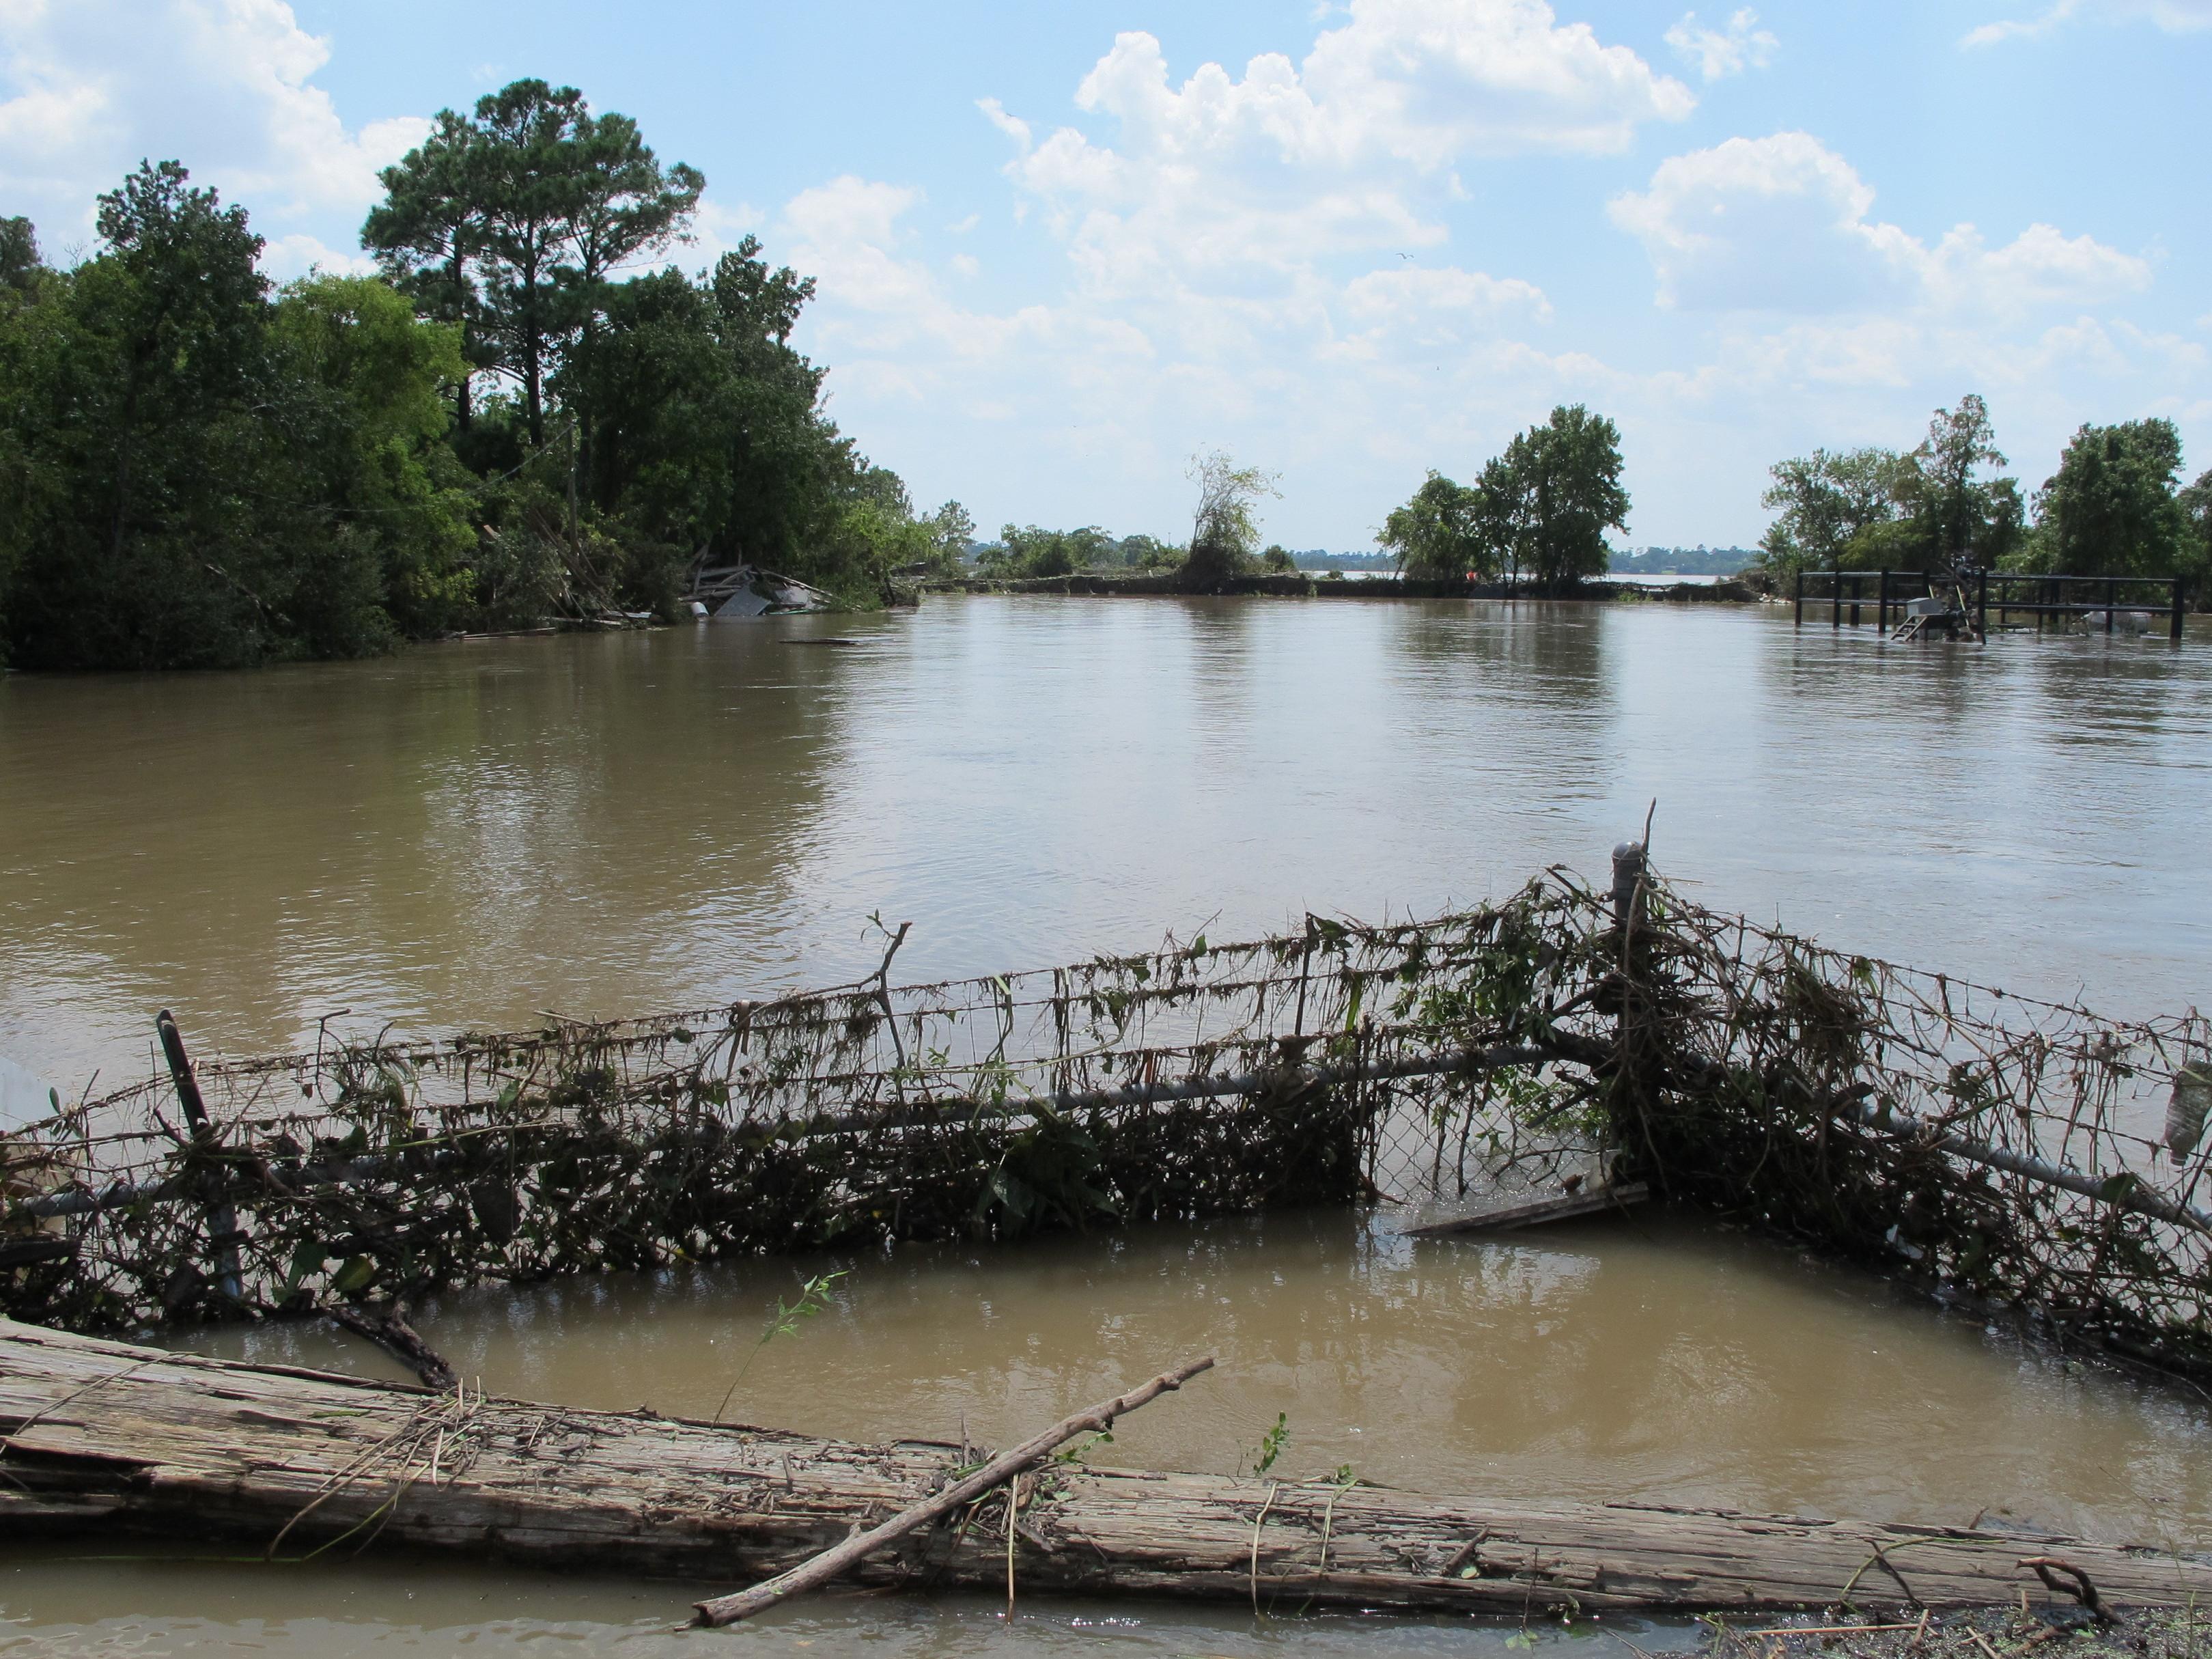 Harvey floods or damages 13 Texas Superfund sites